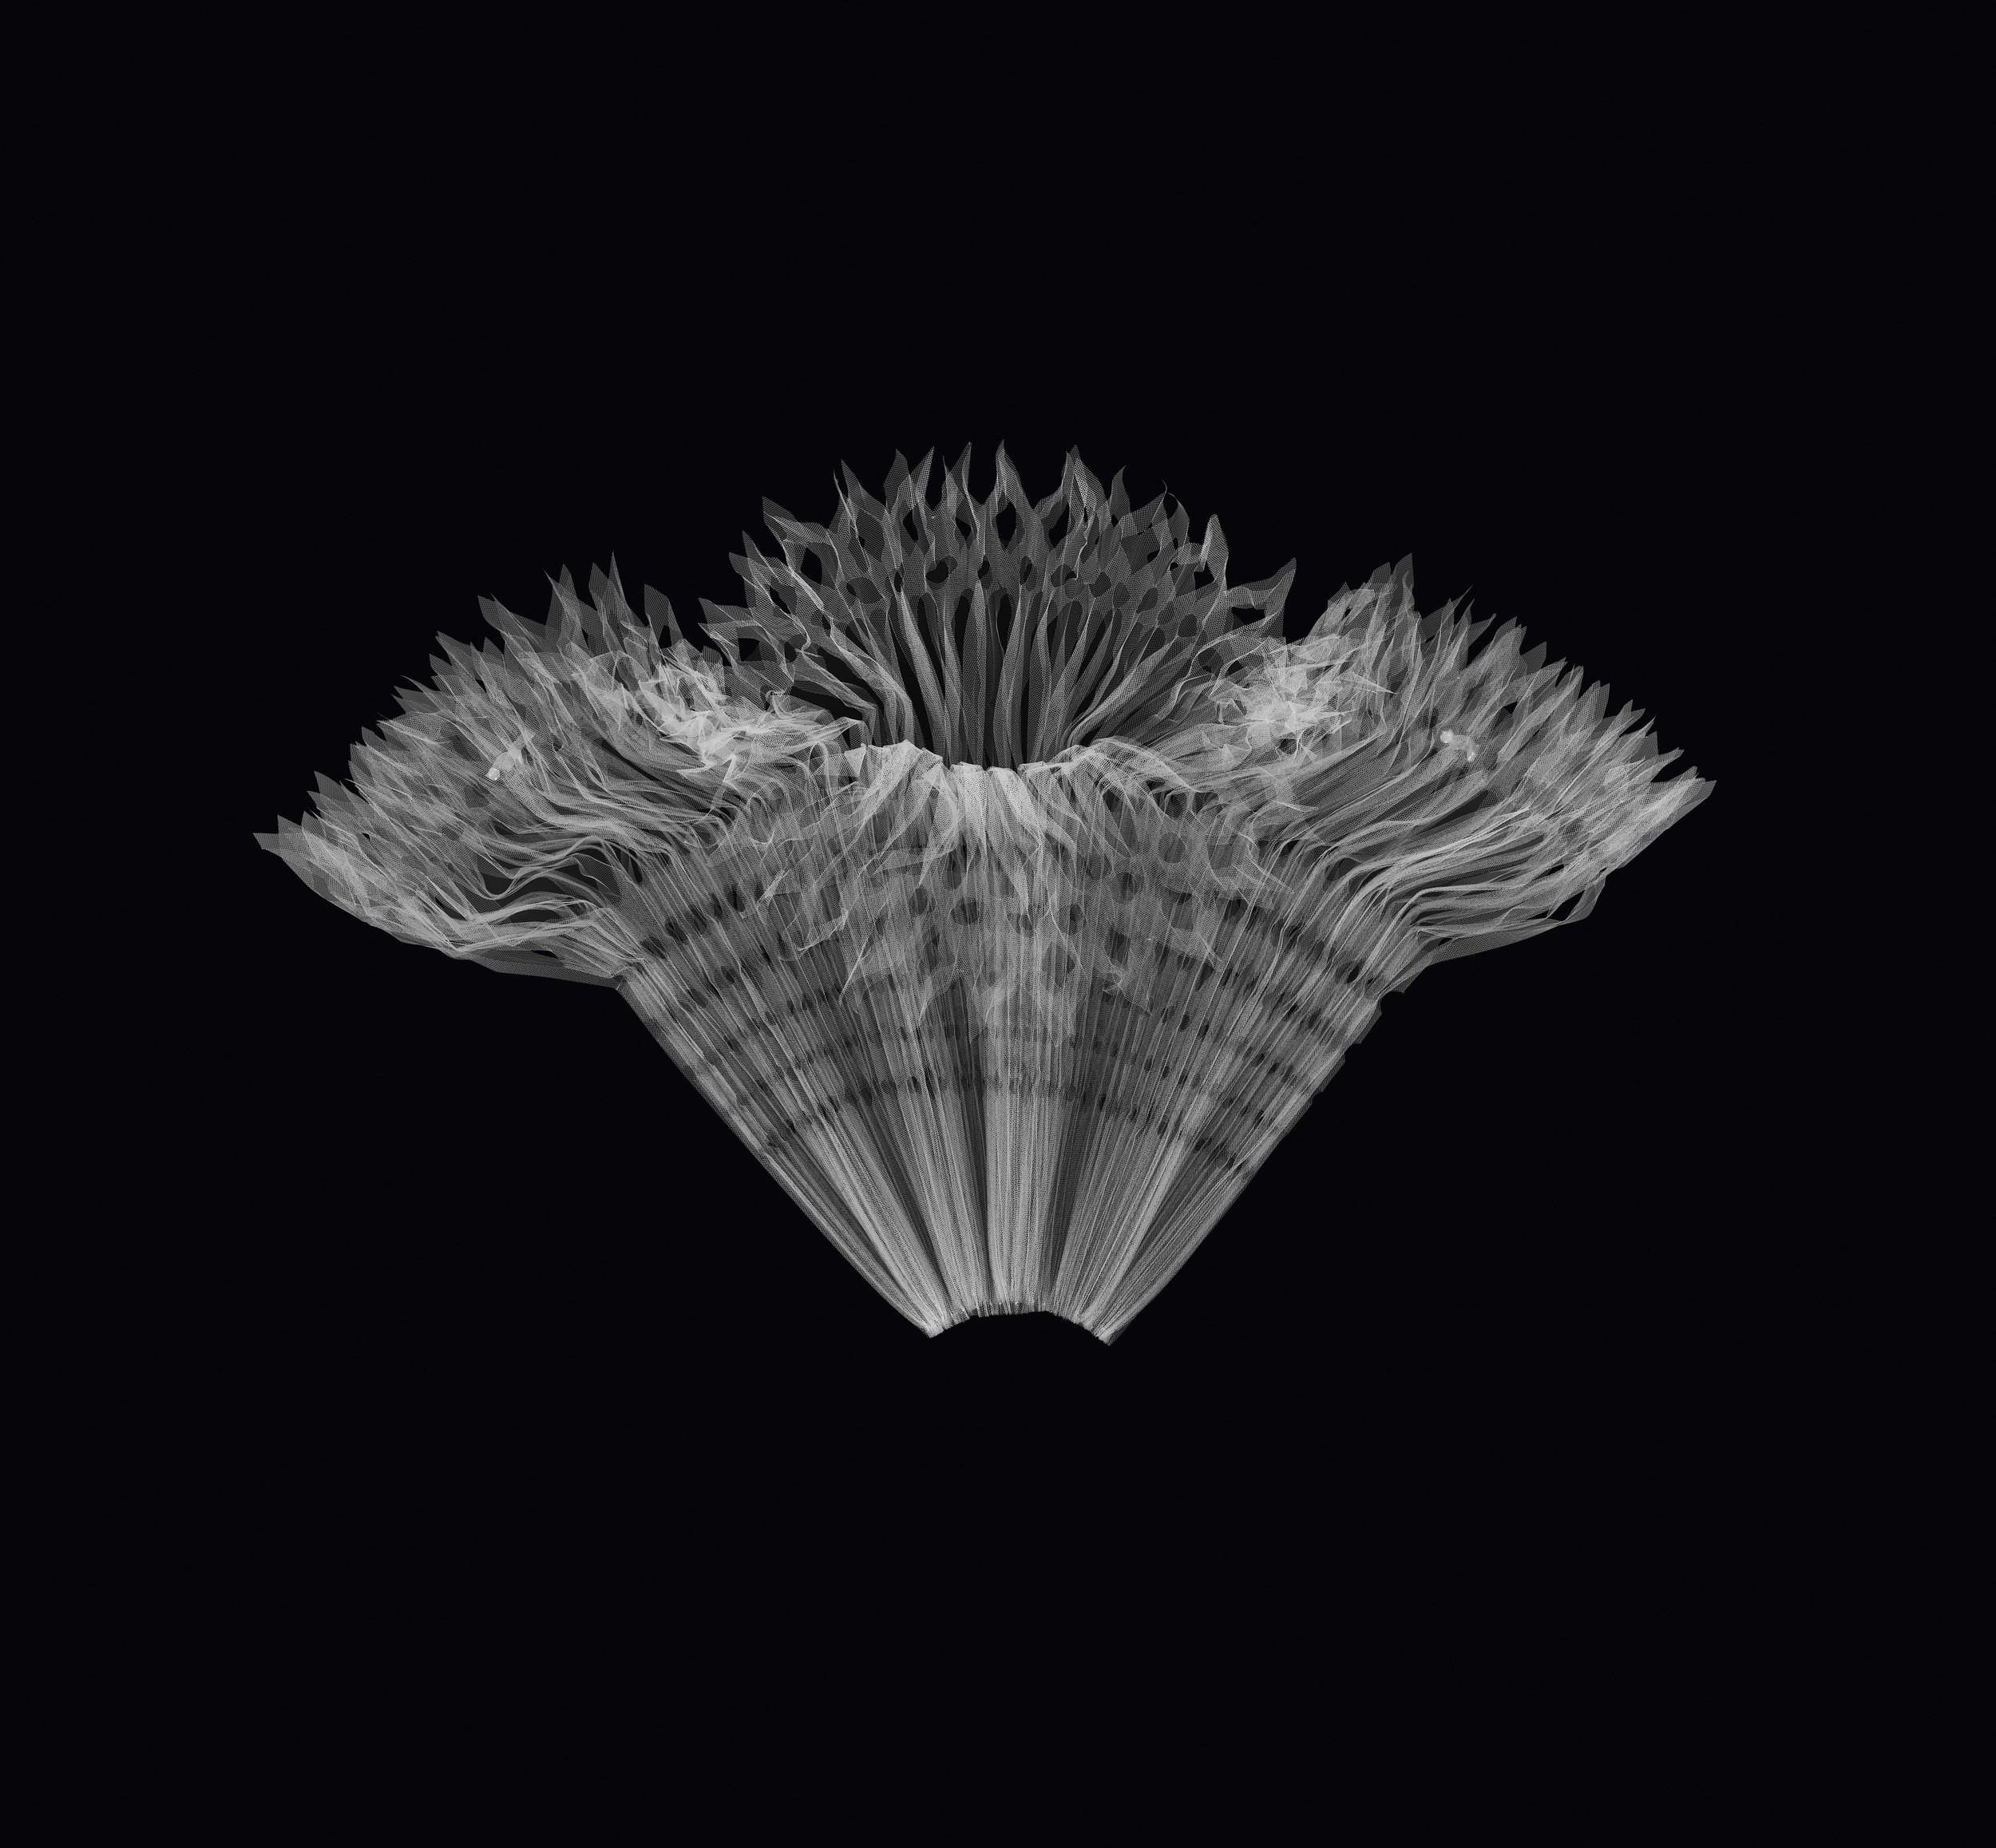 X-Ray simulation 'Origami' shirt, Gianfranco Ferré Spring/Summer 2004 collection (Photography Leonardo Salvini)